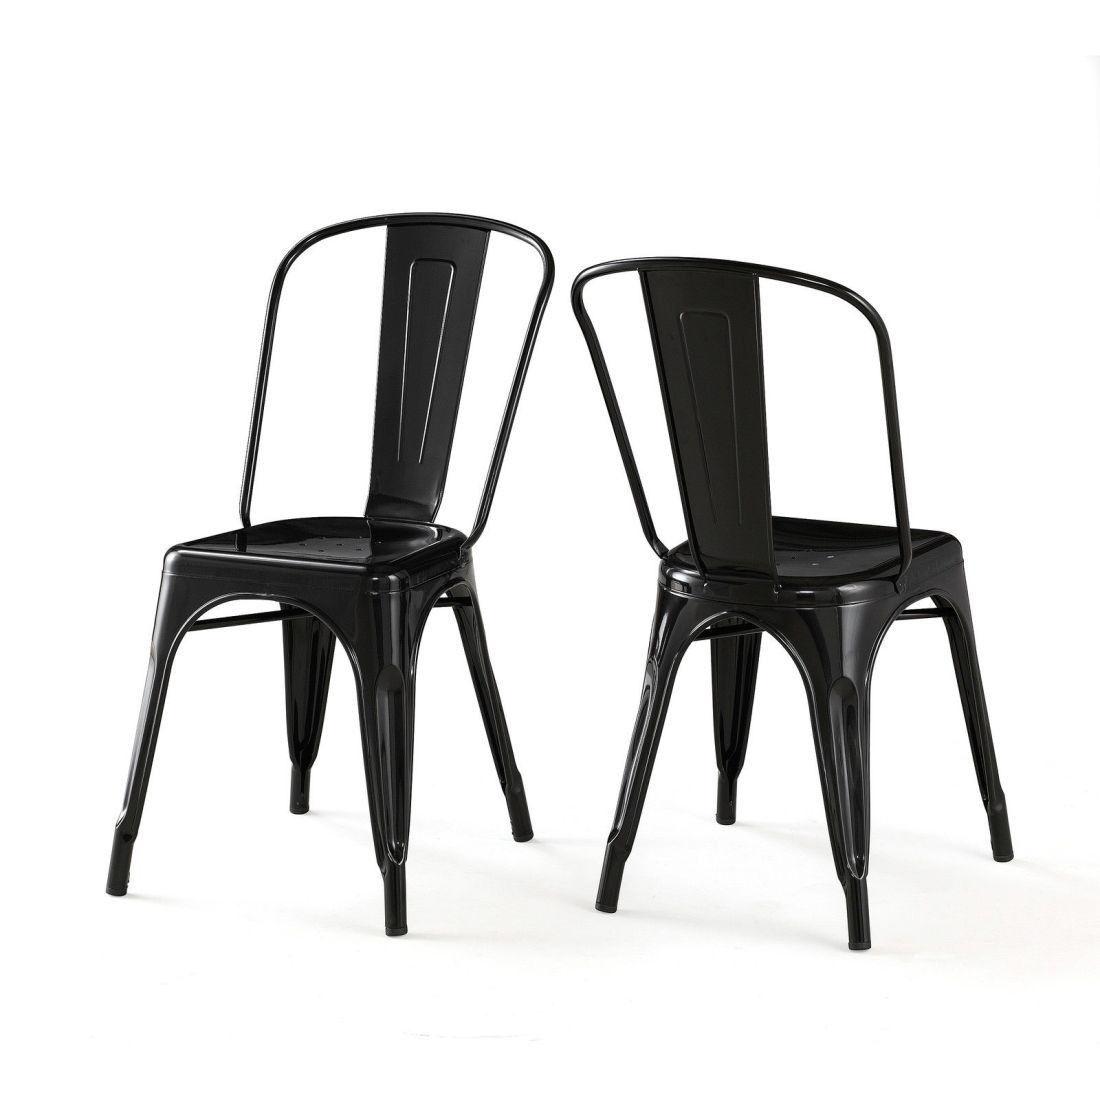 Black Metal Patio Chairs Image Pixelmari Com